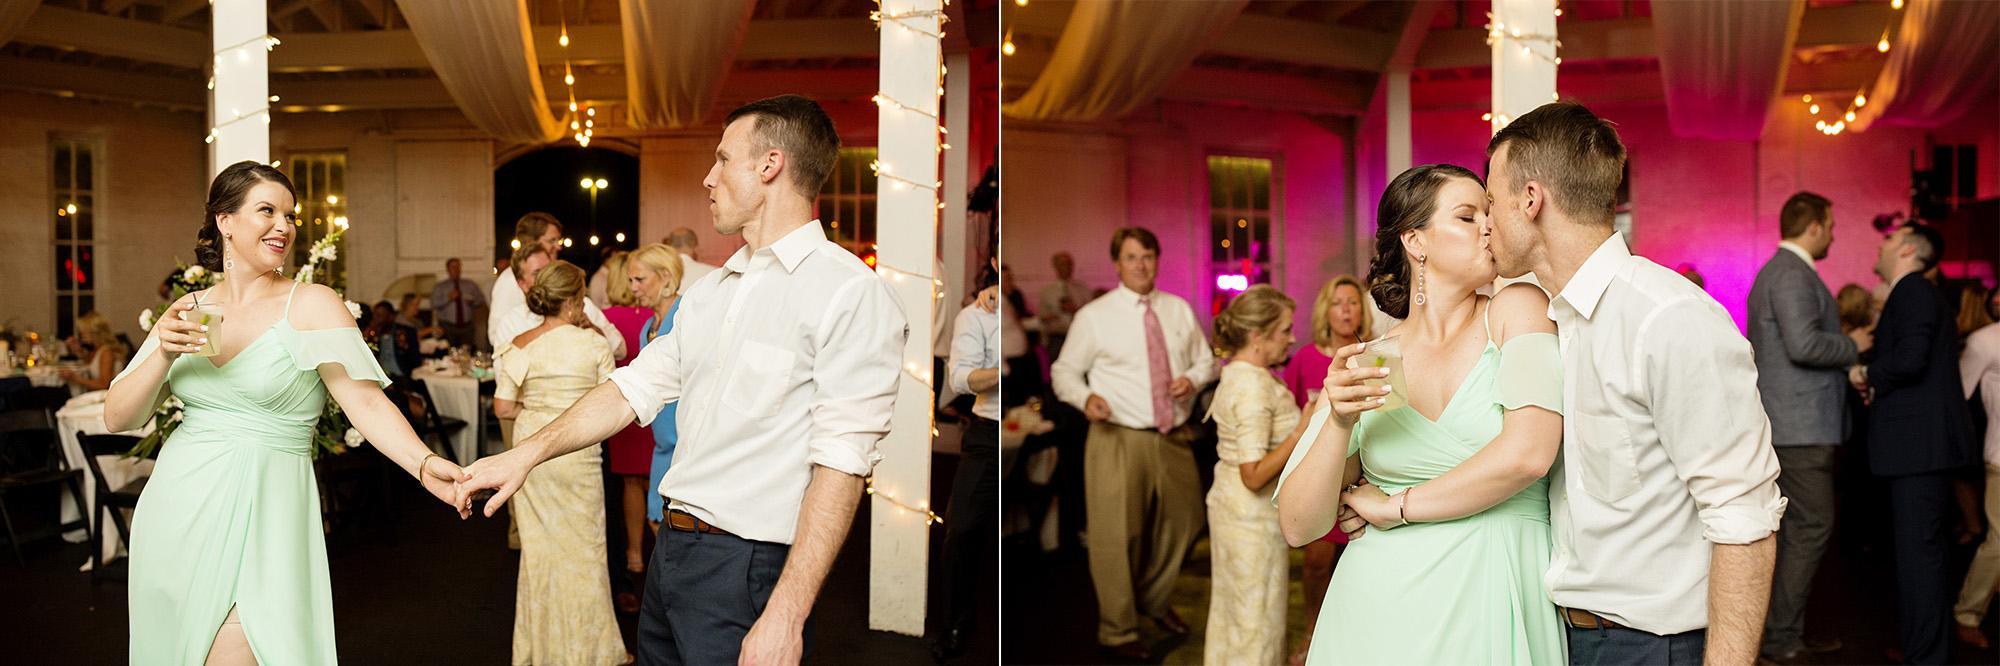 Seriously_Sabrina_Photography_Lexington_Kentucky_Pax_Christi_Round_Barn_Wedding_Beath_133.jpg